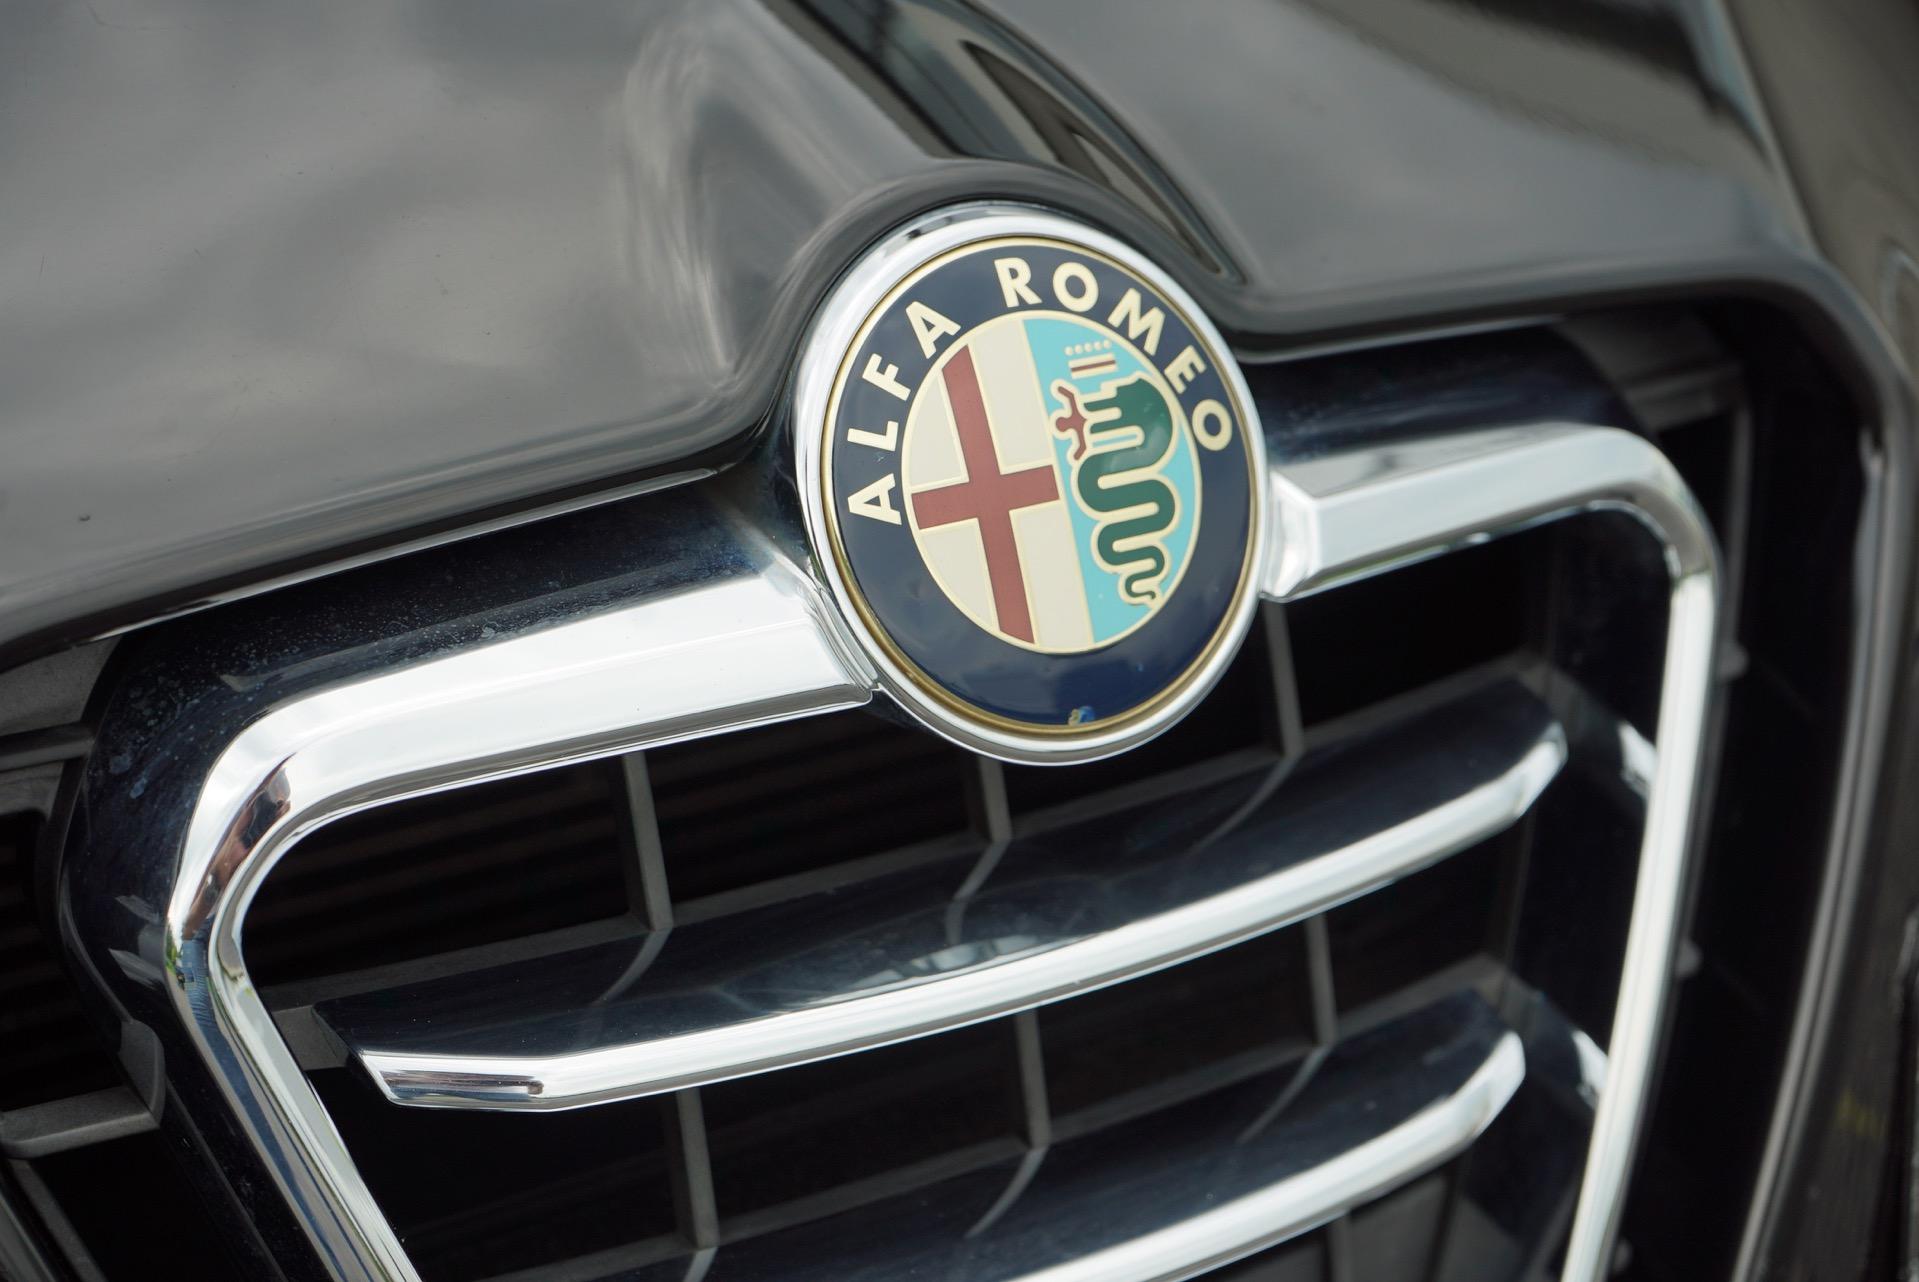 ALFA ROMEO GIULIETTA 1.4 TURBO MULTIAIR DISTINCTIVE 170